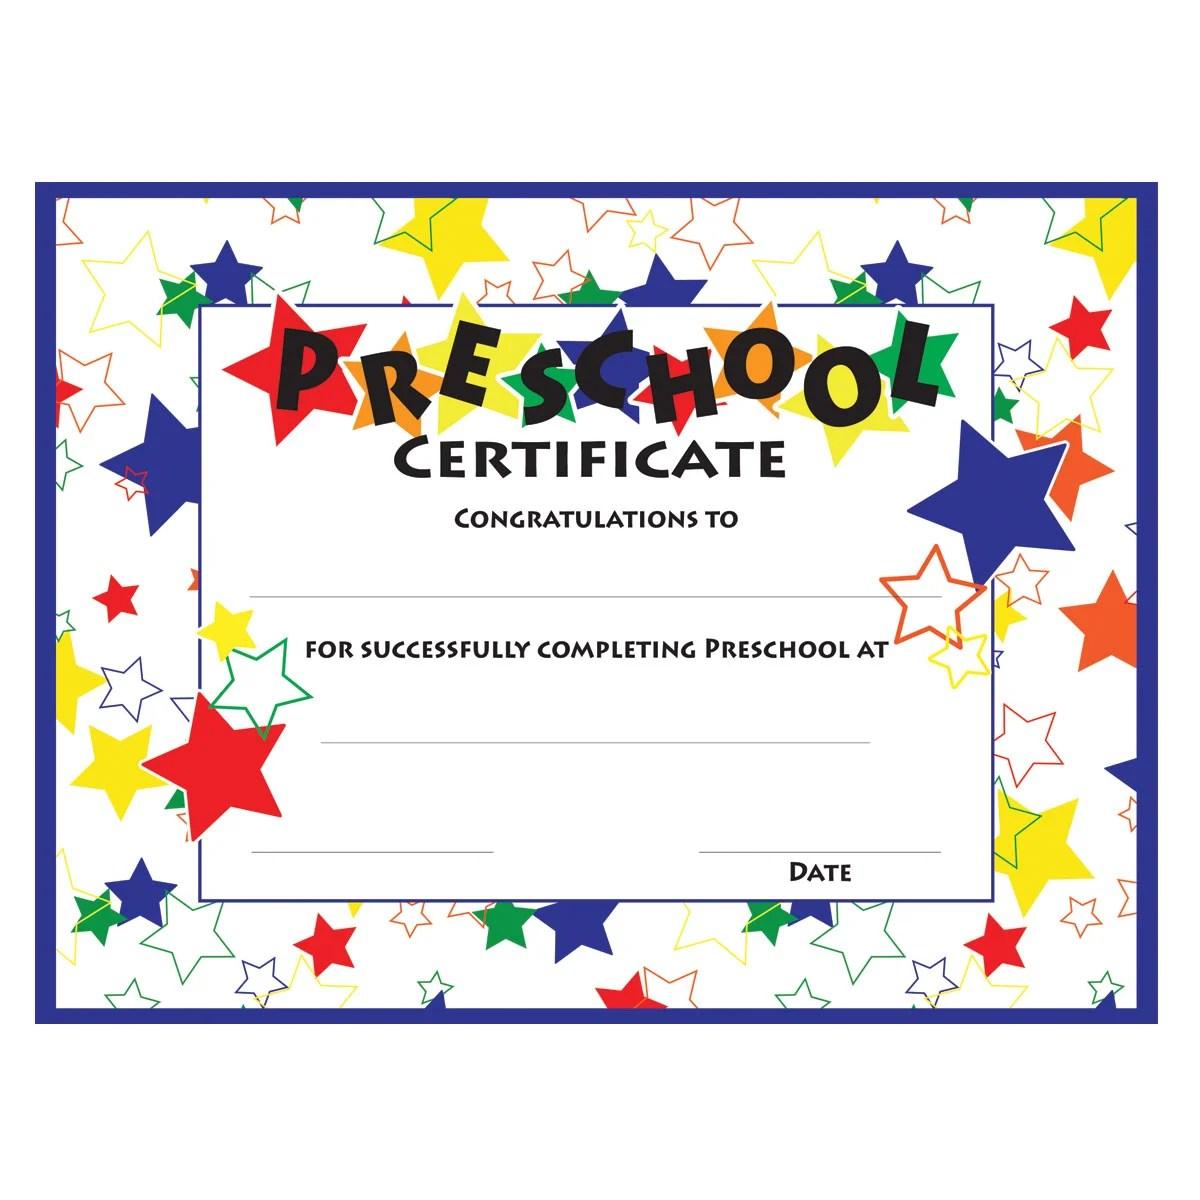 11 Preschool Certificate Templates